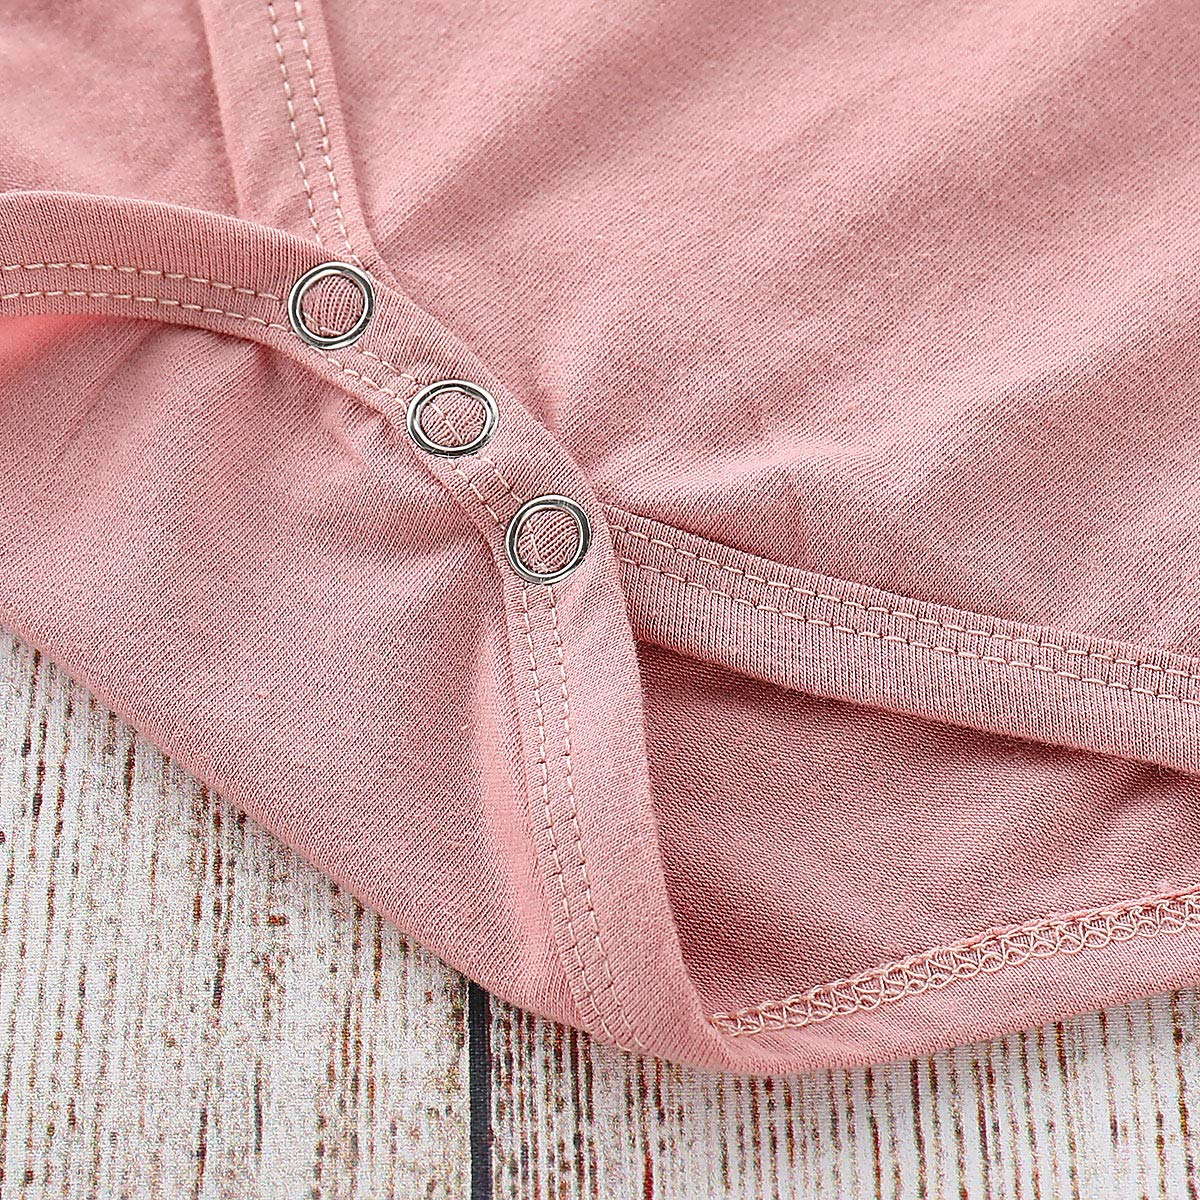 VISGOGO 3PCS Toddler Kids Baby Girls Short Sleeve Romper Tops Strap Skirt Dress Headband Outfit Clothes Set